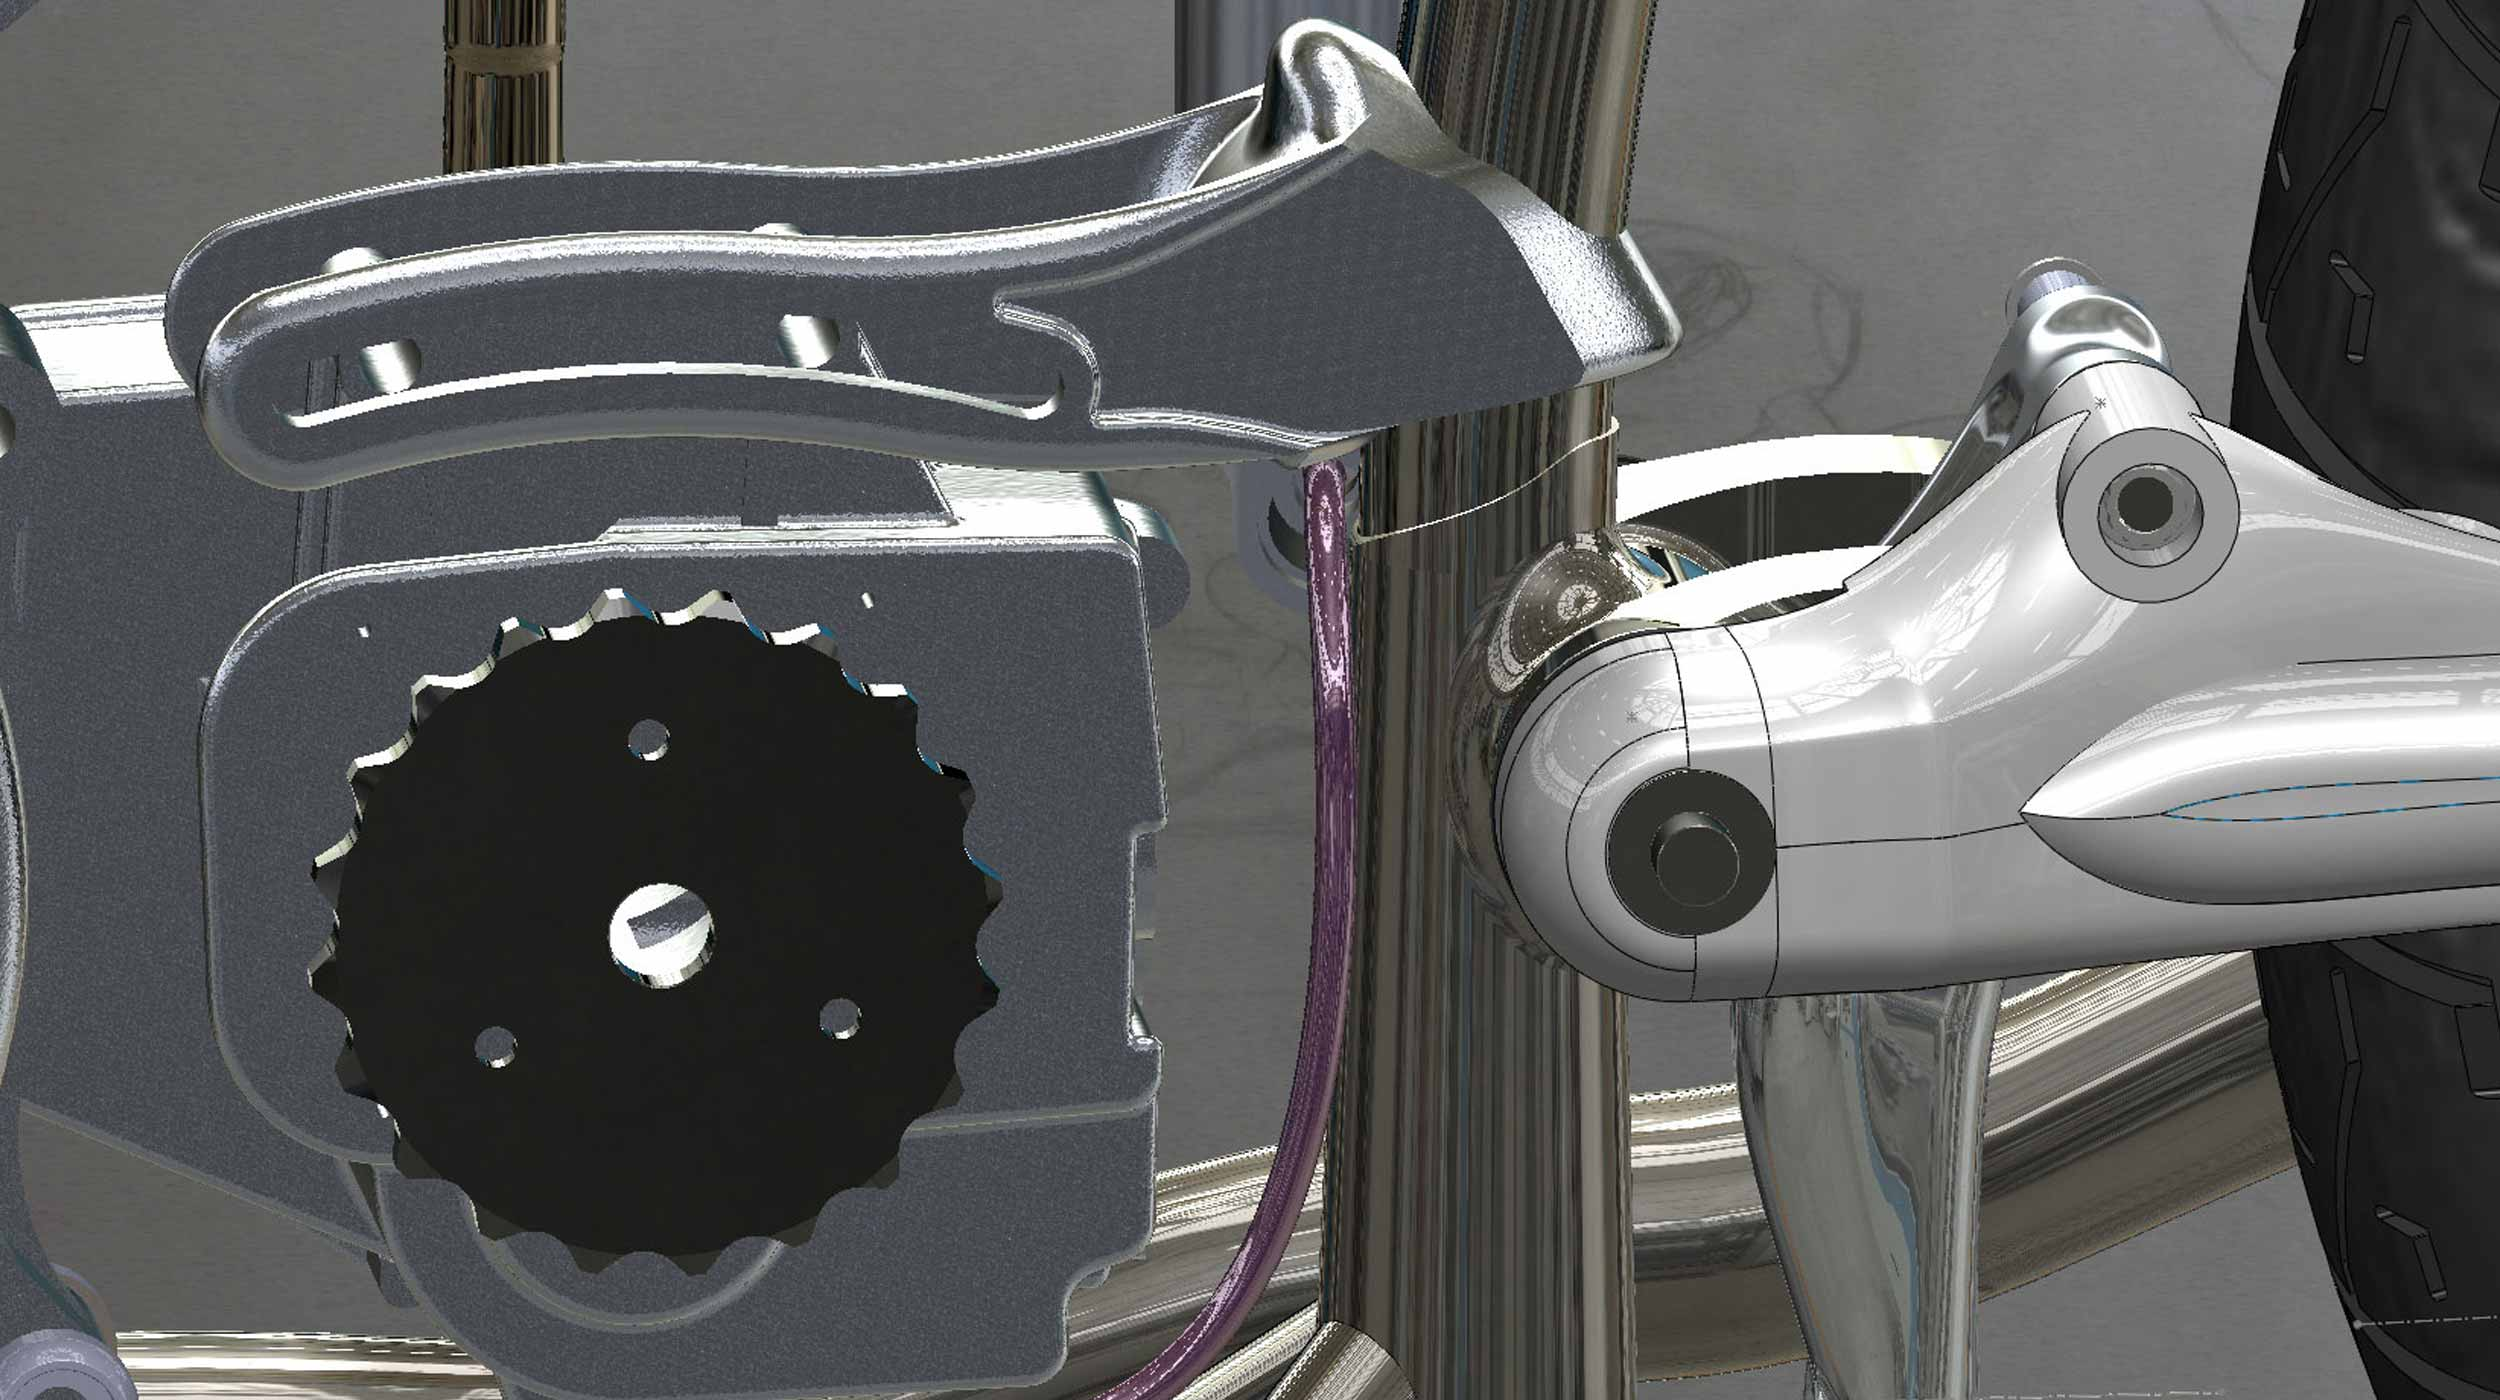 White-Gearbox-Mount-Profile-concept.jpg